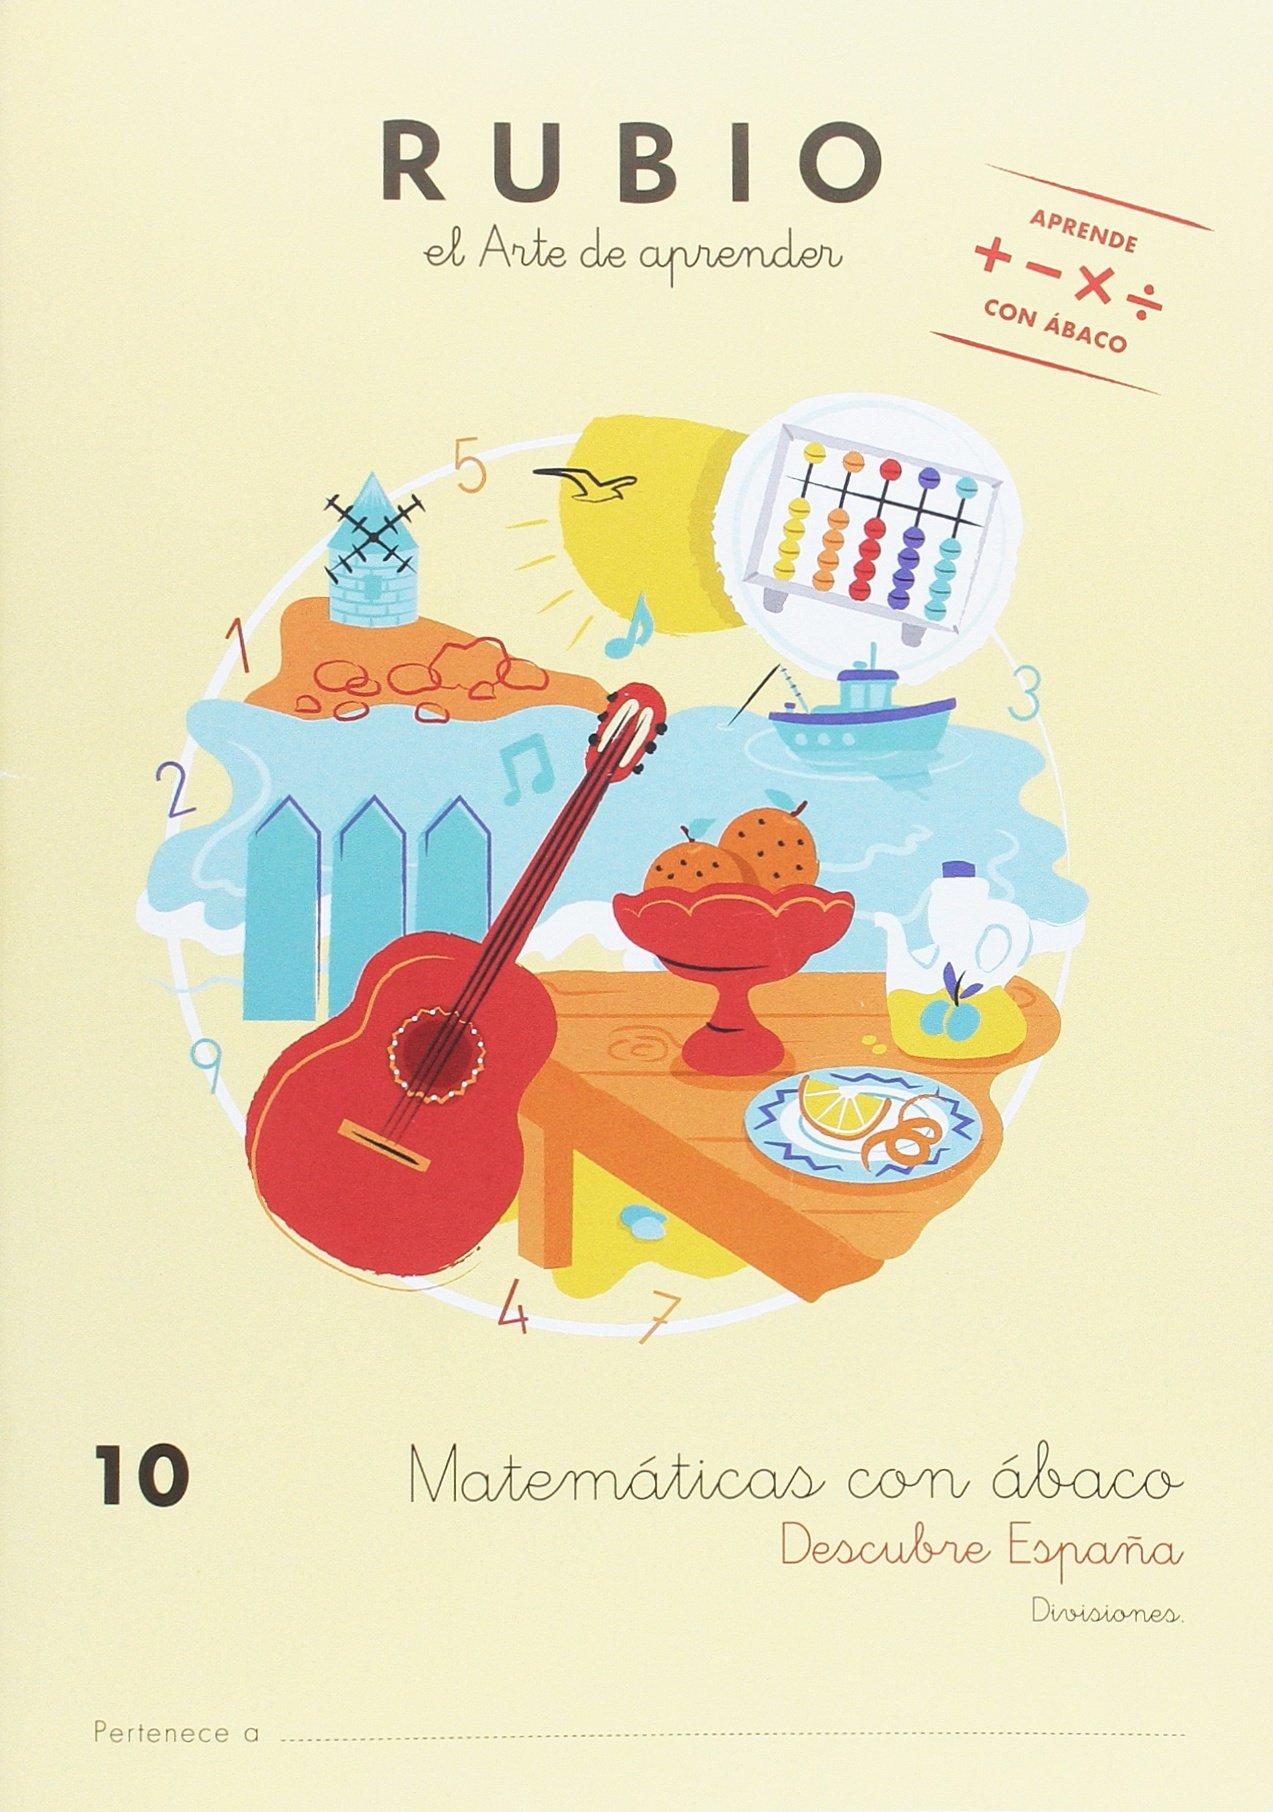 MATEMÁTICAS CON ÁBACO 10: Amazon.es: ENRIQUE RUBIO POLO, SLU: Libros